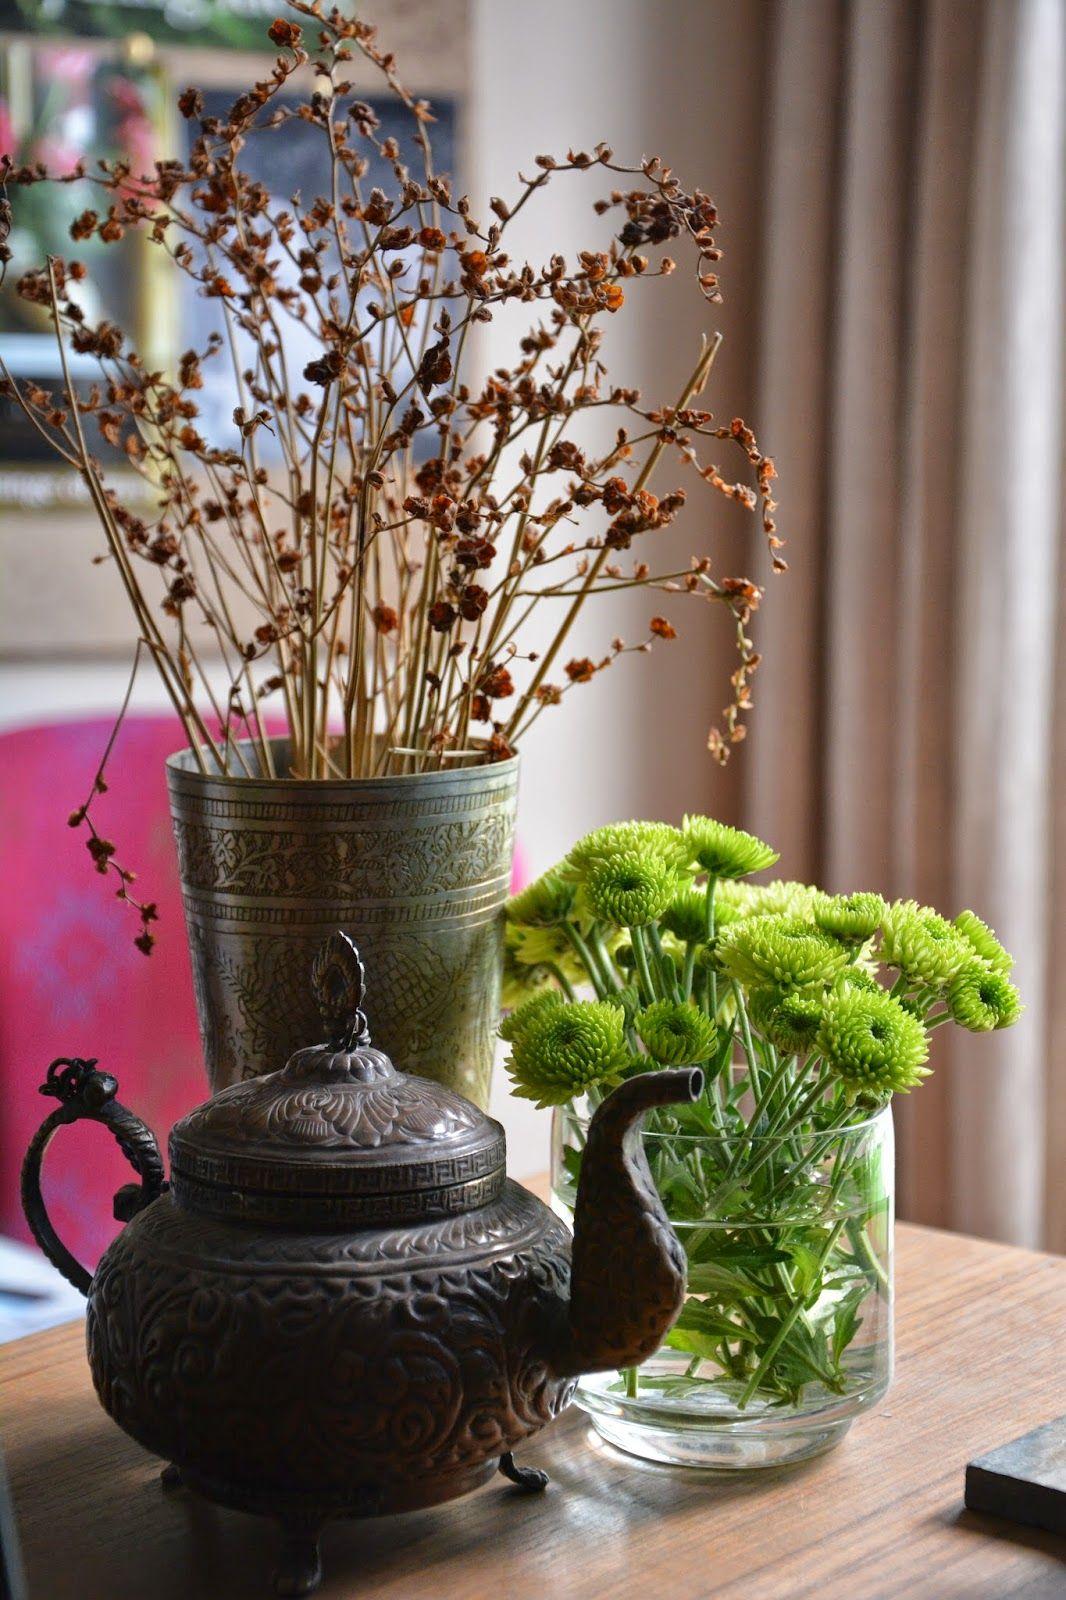 Rajee Sood Indian home decor, Tray decor, Garden crafts